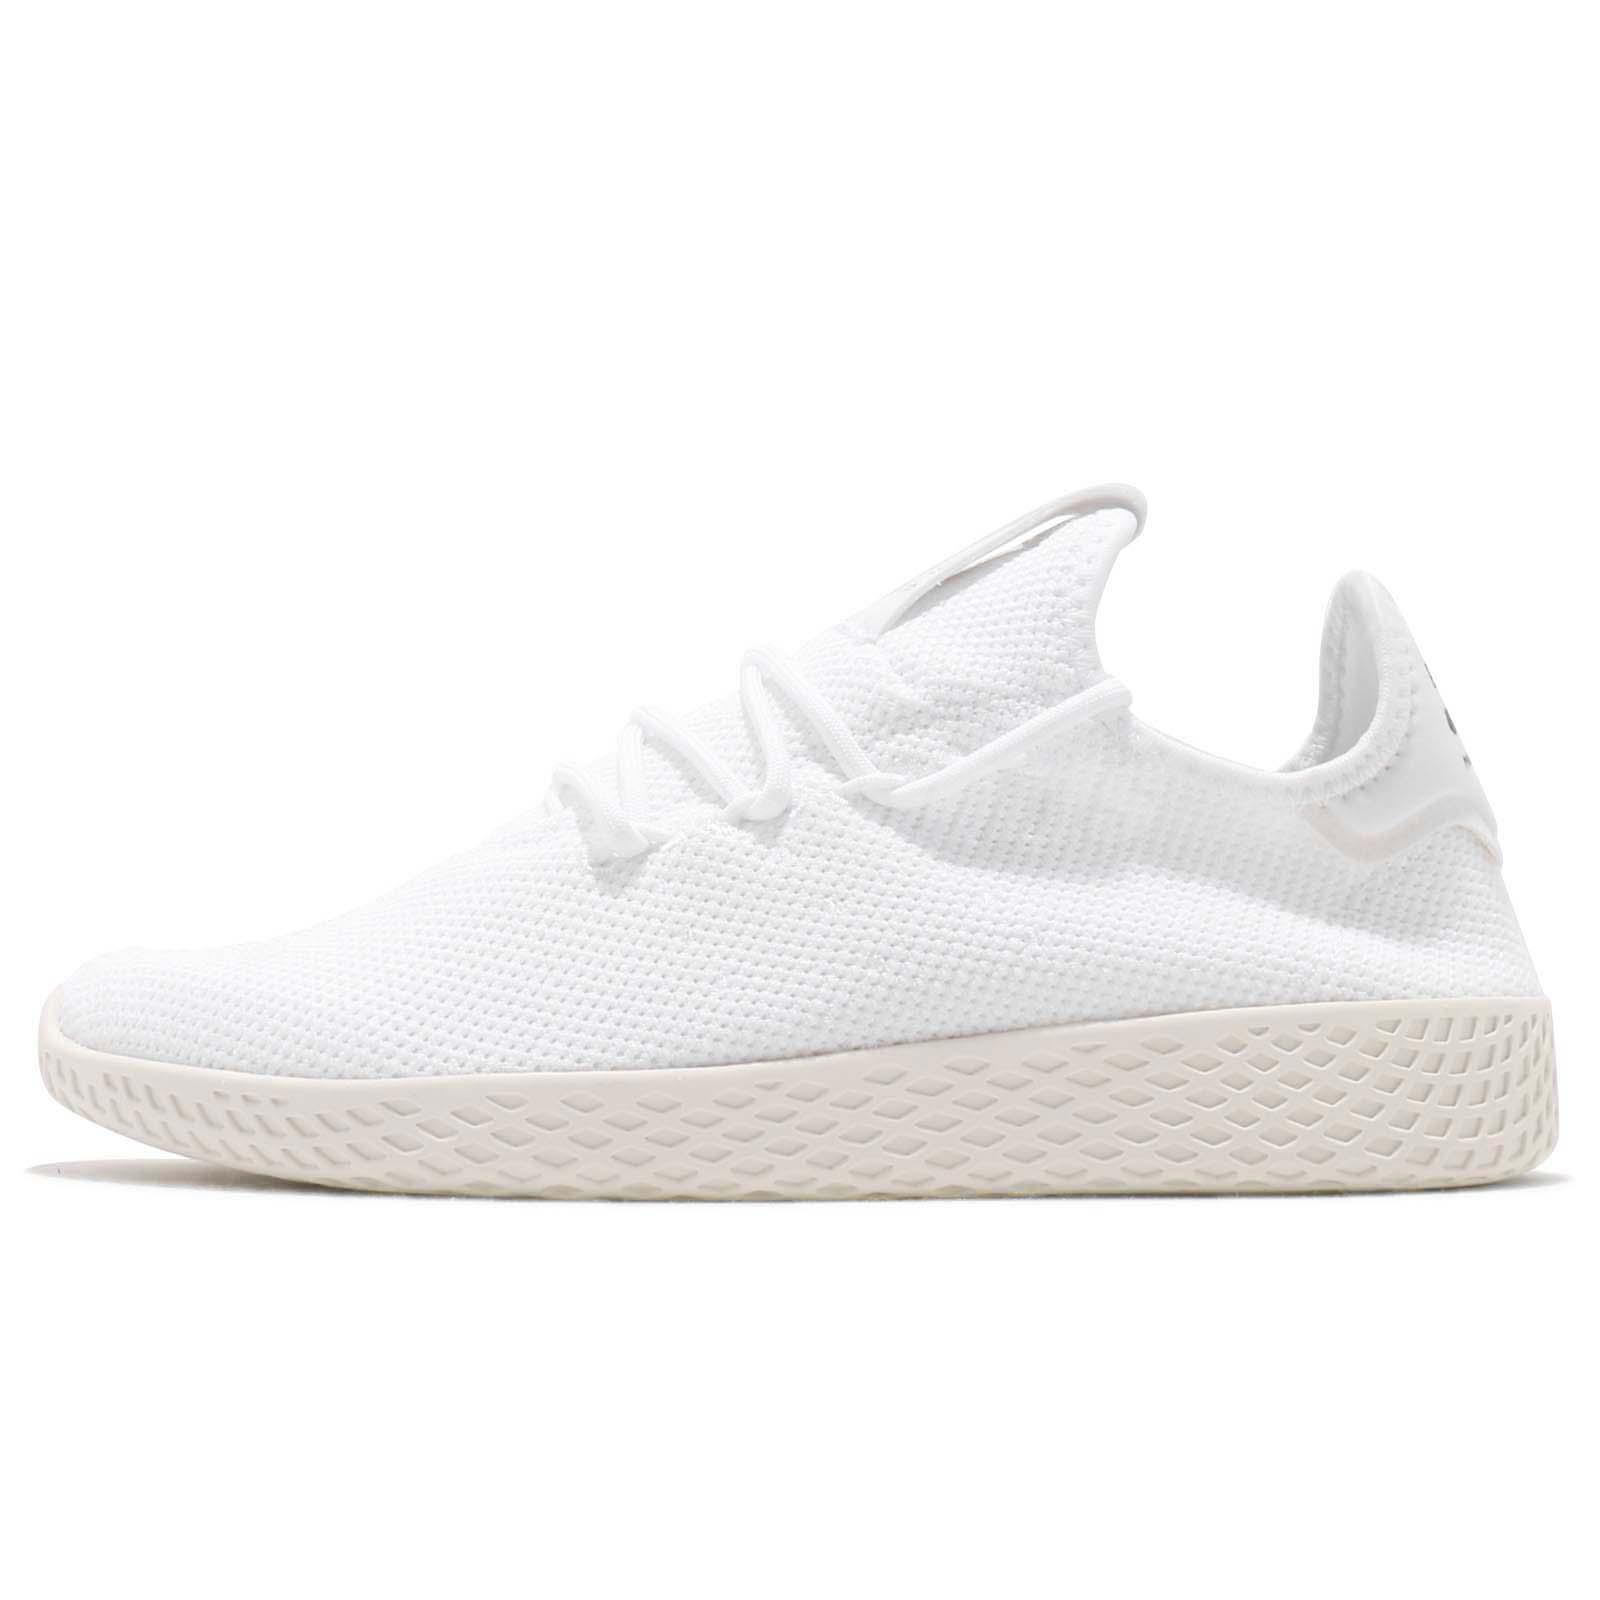 brand new a2747 b642a adidas Originals PW Tennis Hu Pharrell Williams White Black Men Women B41792